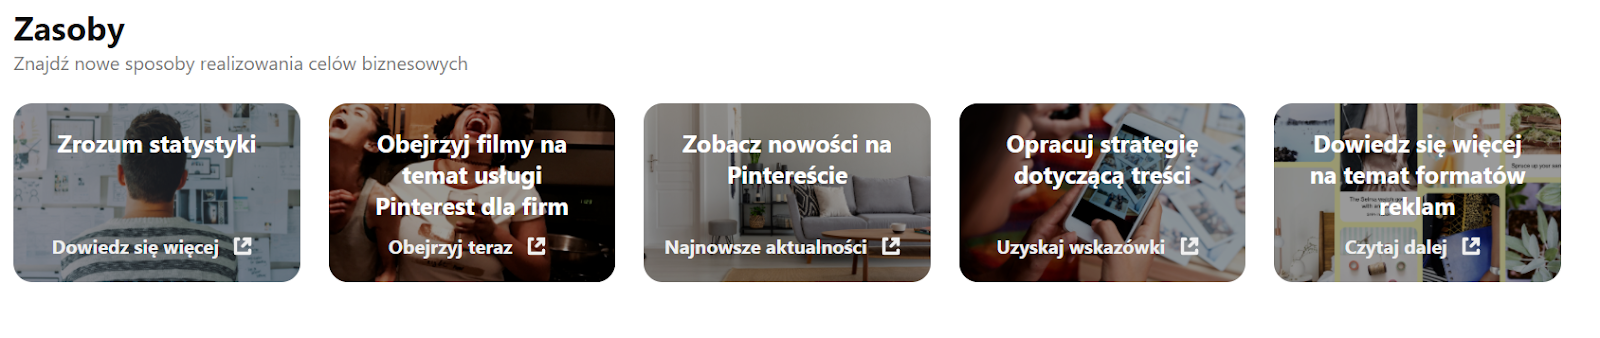 Pinterest - zasoby (screen)